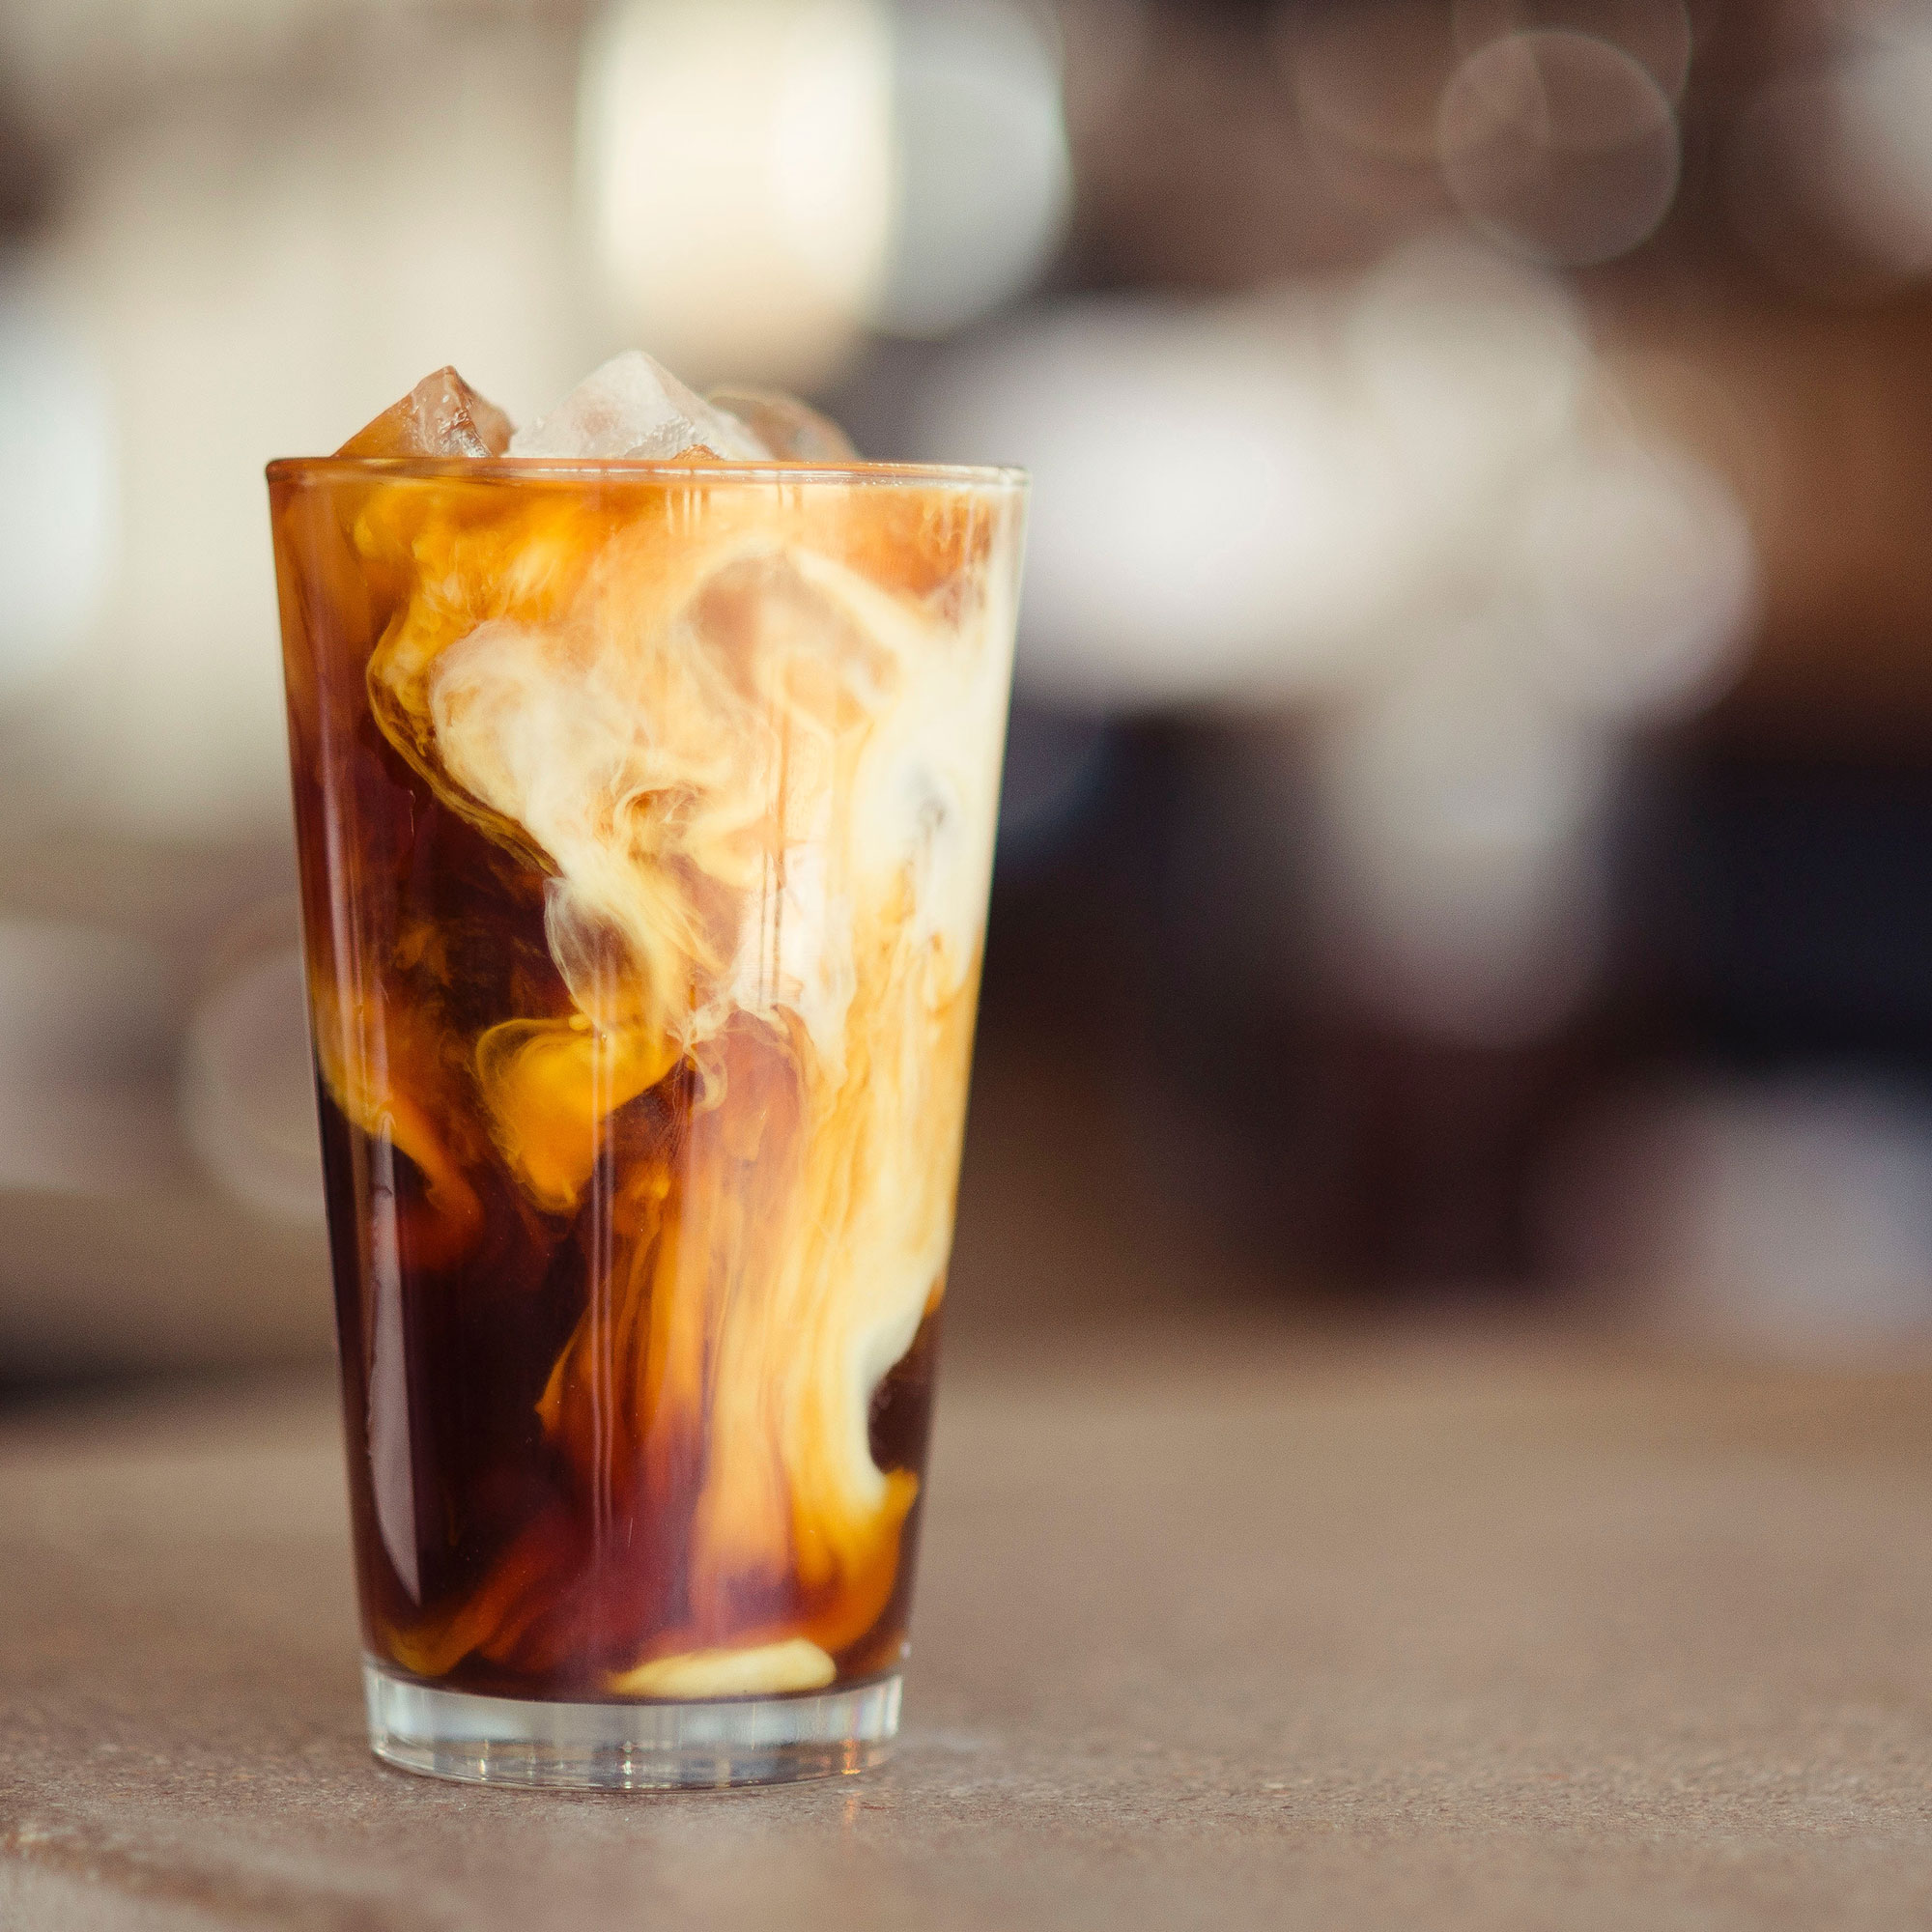 Cafe-Matteo-Cairns-Iced-Coffee.jpg